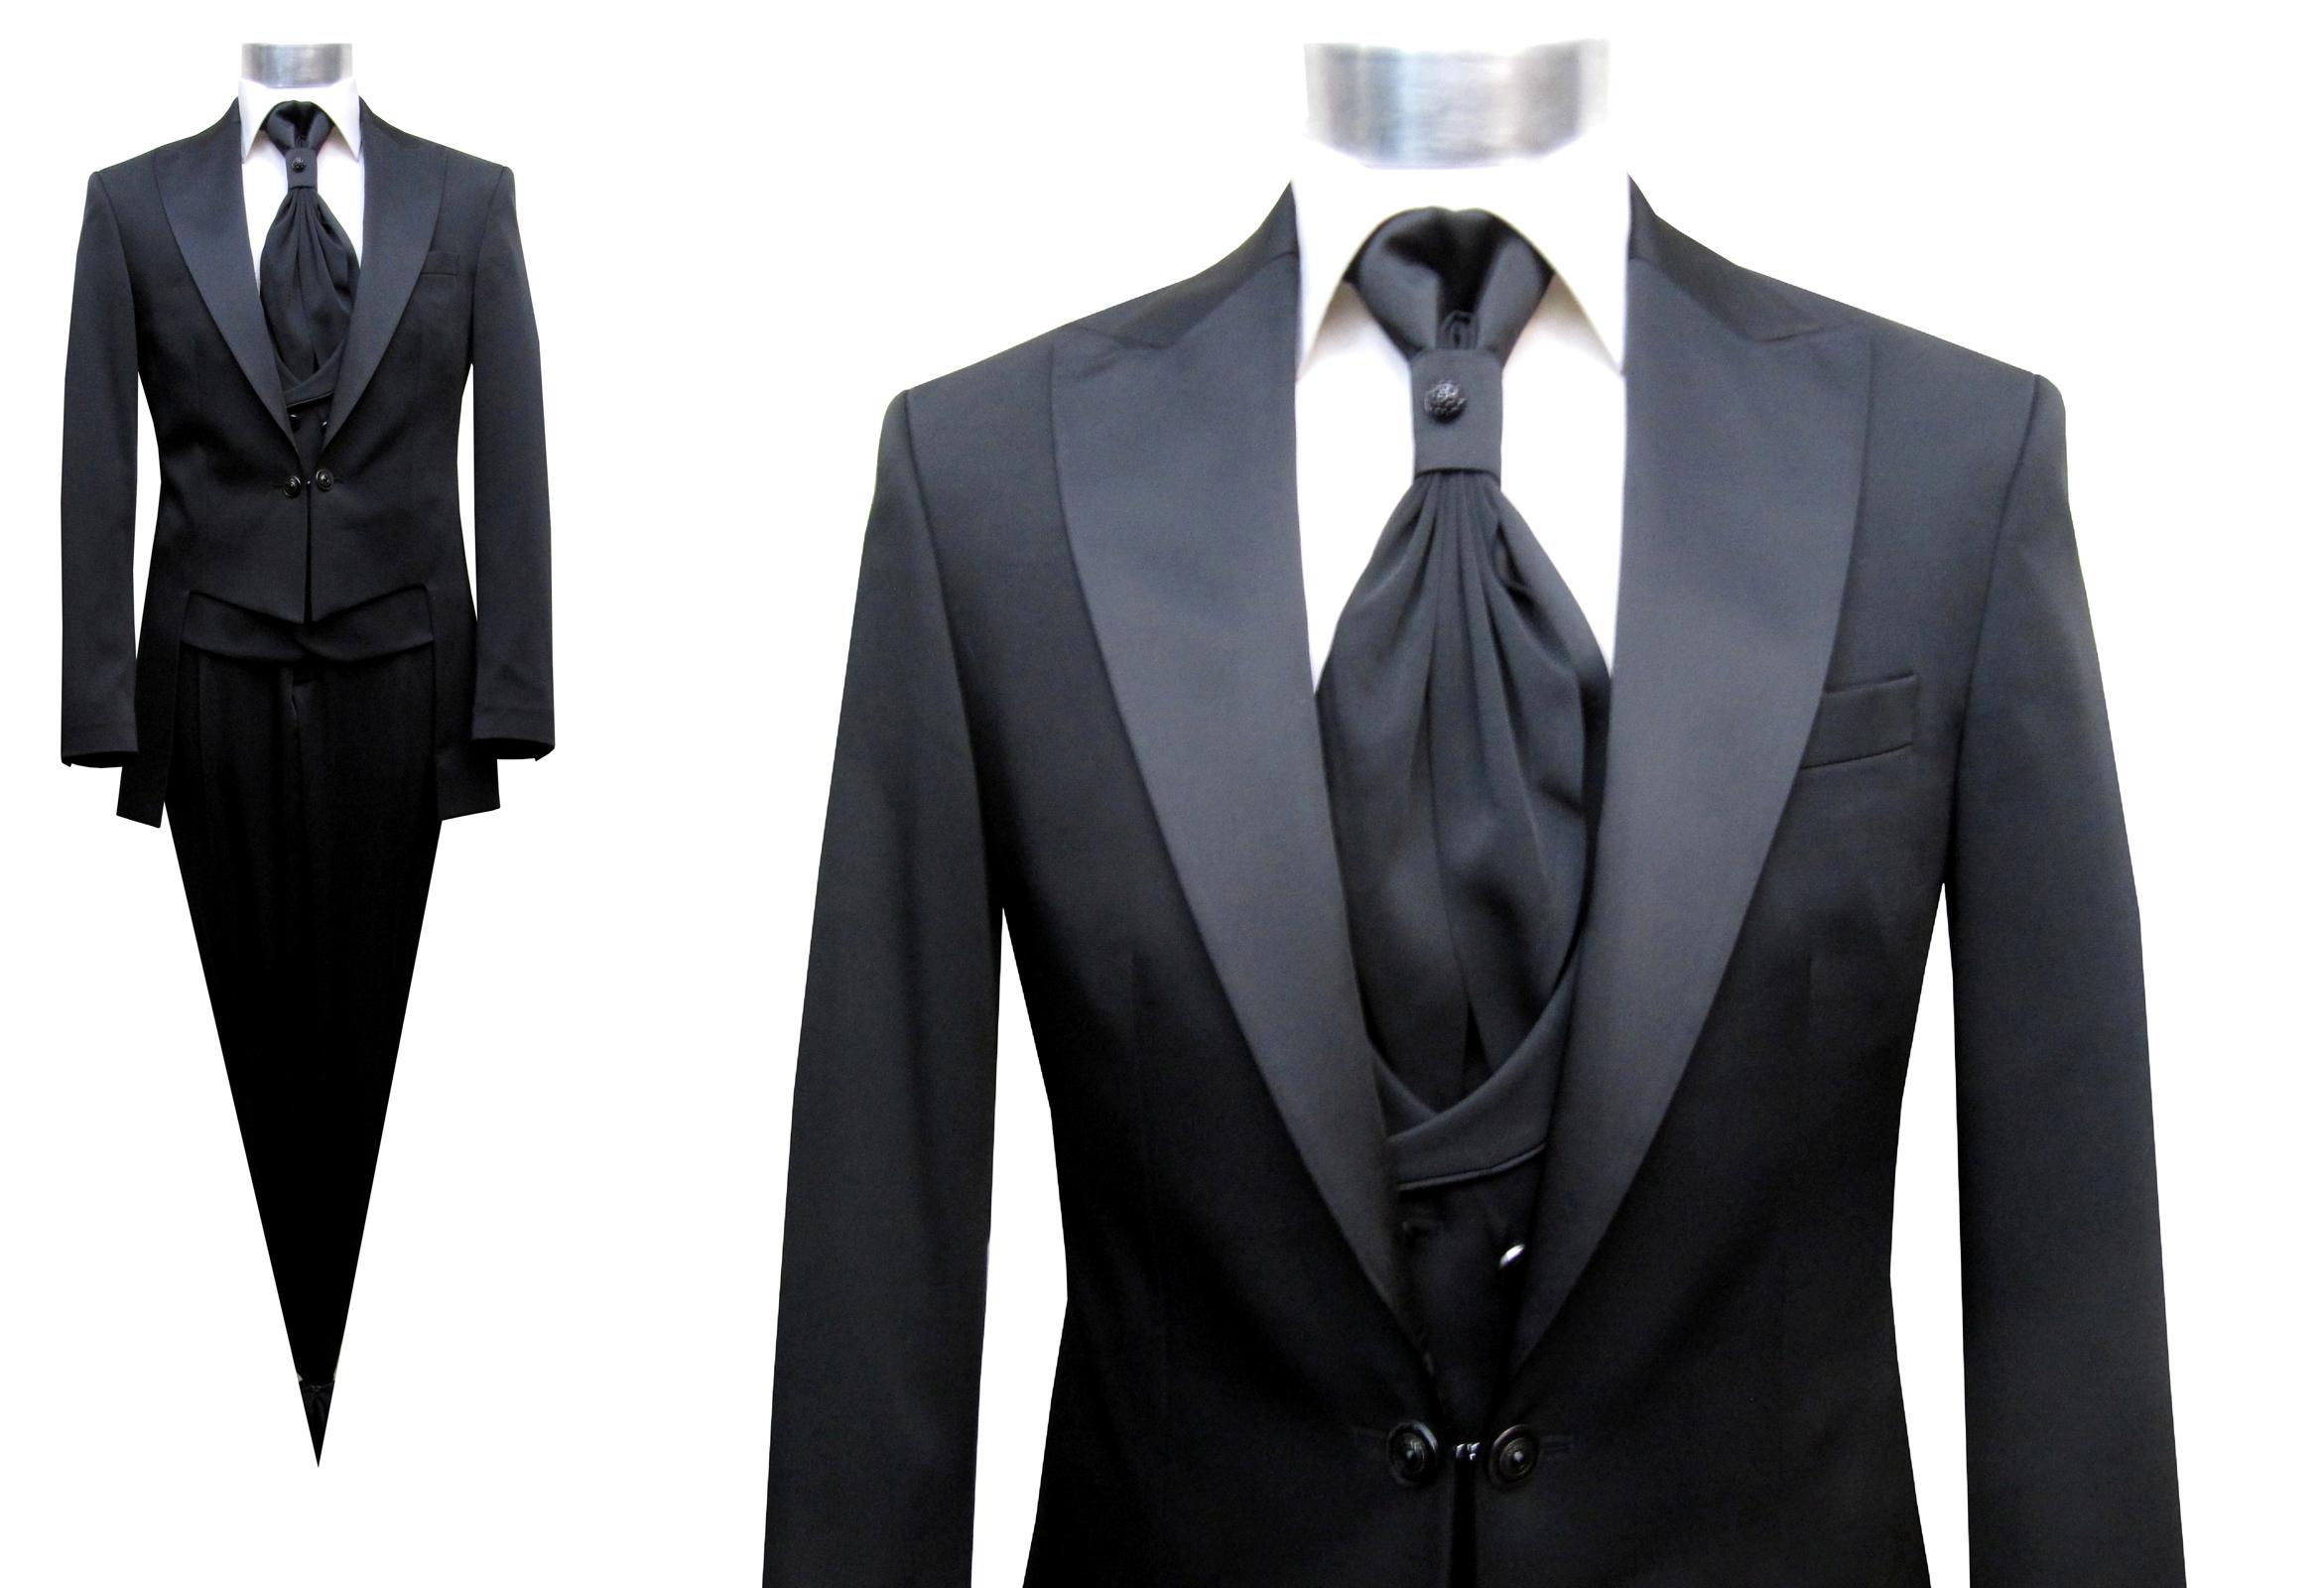 Details zu Hochzeitsanzug Cutaway Anzug 6 teilig Gr.56 Schwarz